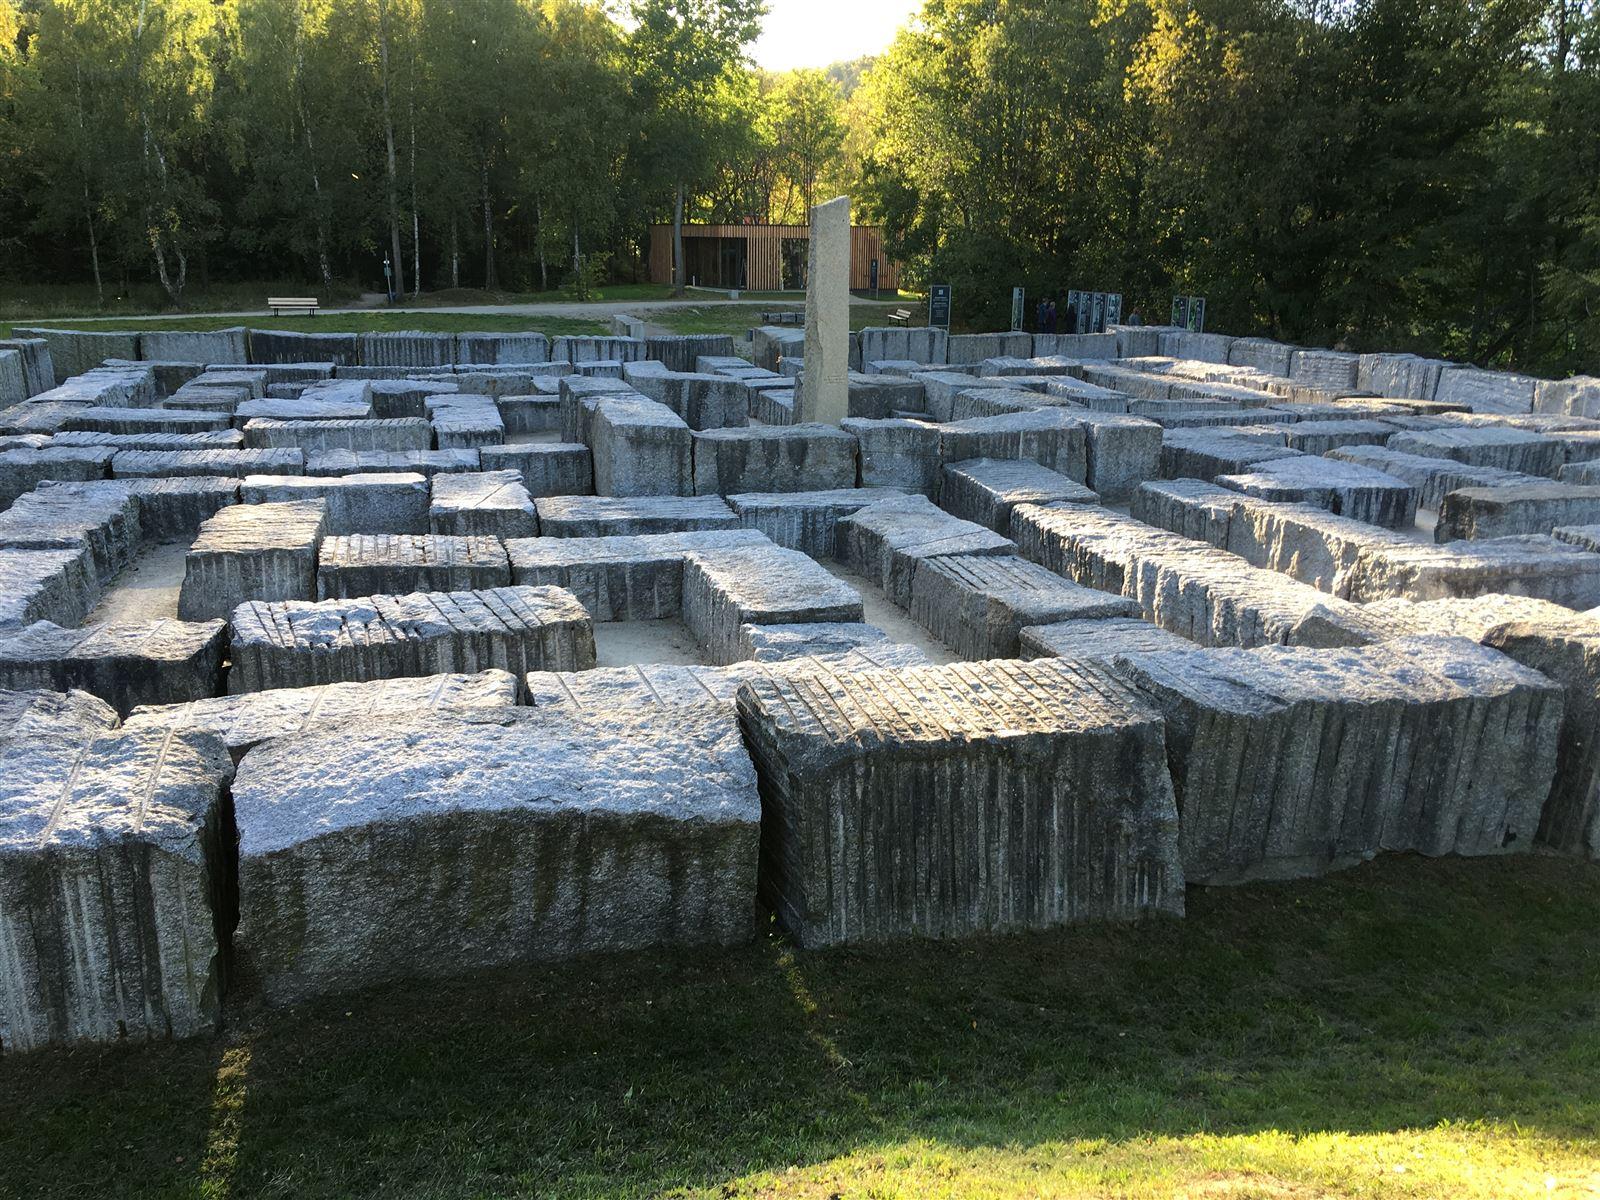 Blick auf das Granitlabyrinth